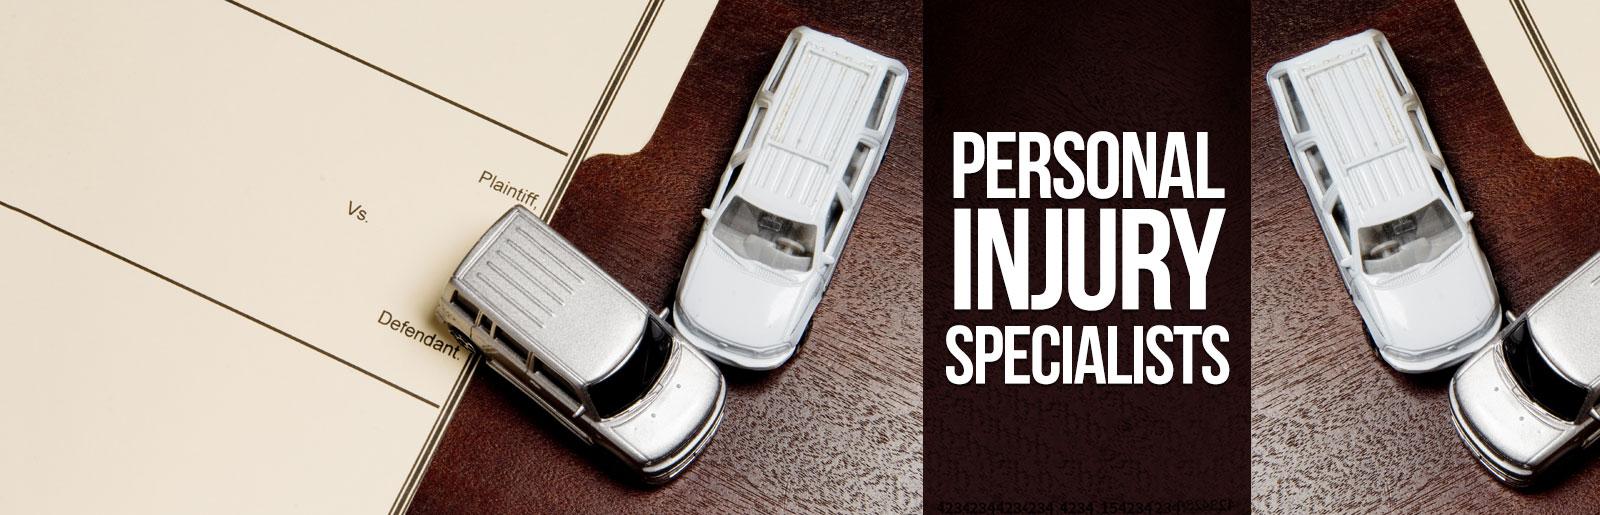 Personal-Injury-Specialist-Joesph-Mc-Nally---Slider-NEW